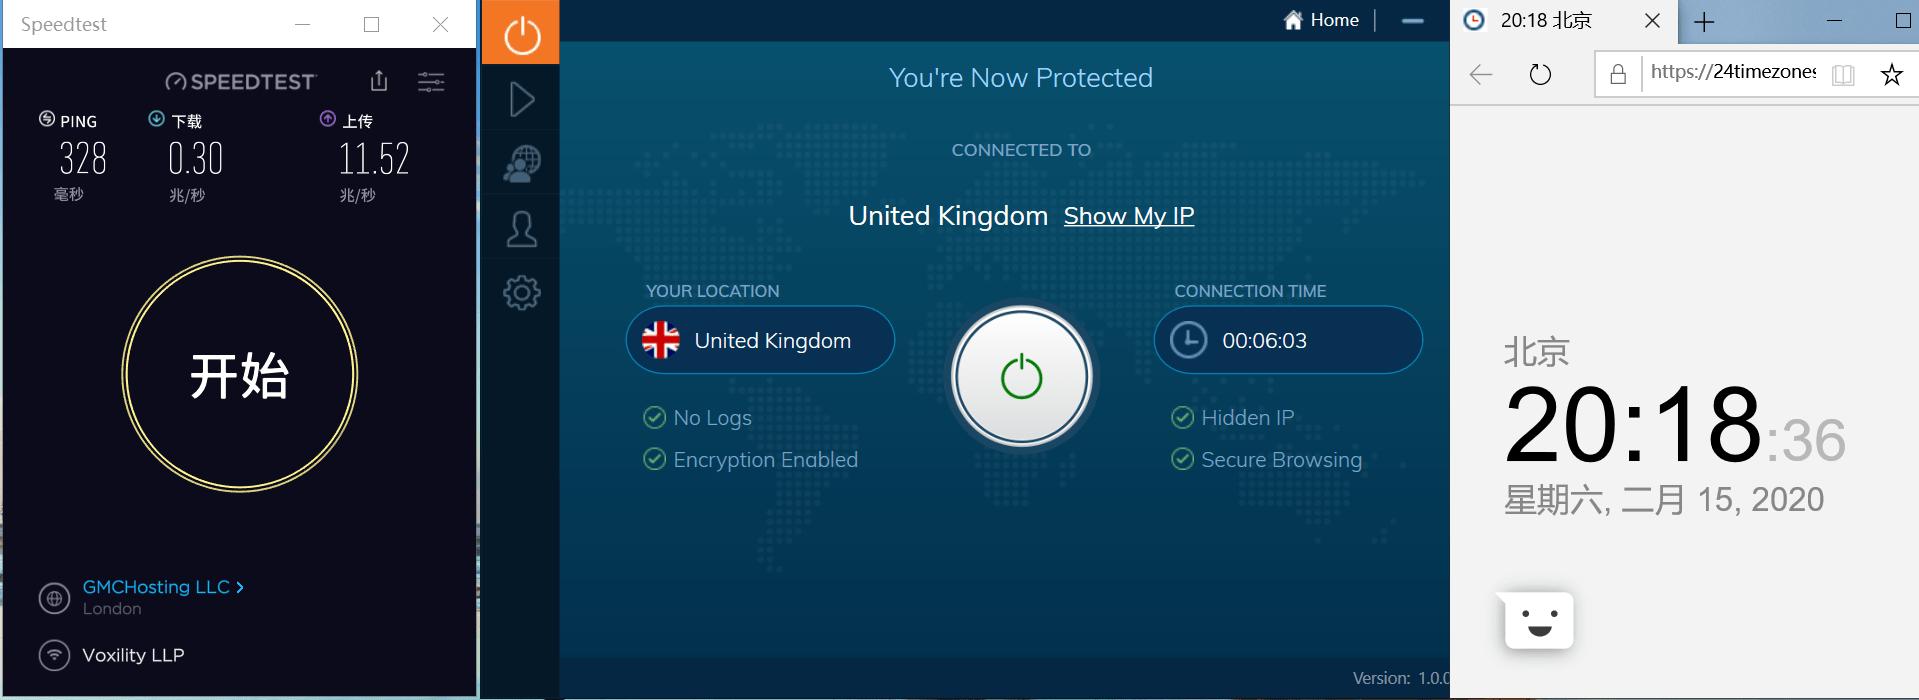 Windows10 IvacyVPN UK 中国VPN翻墙 科学上网 SpeedTest测速-20200215